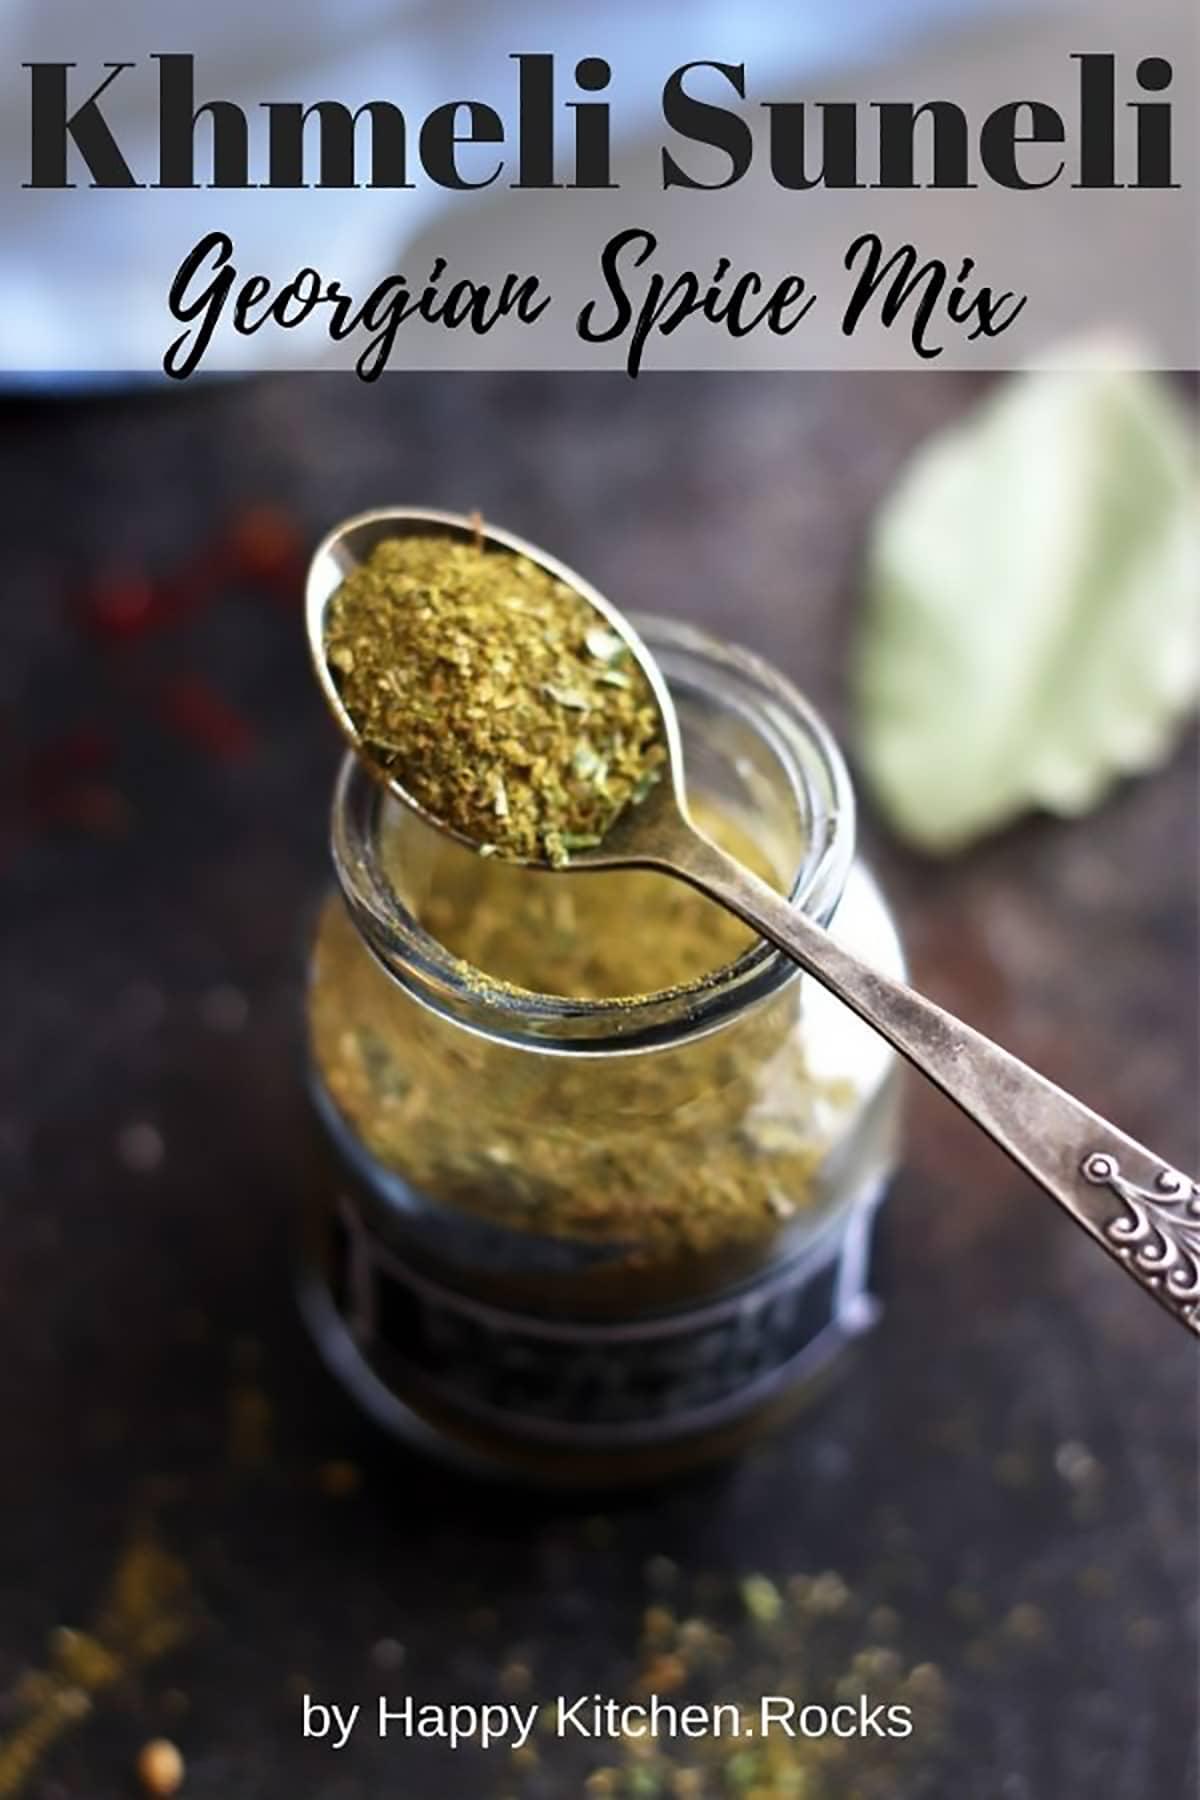 Khmeli Suneli Spice Mix Pinterest Image